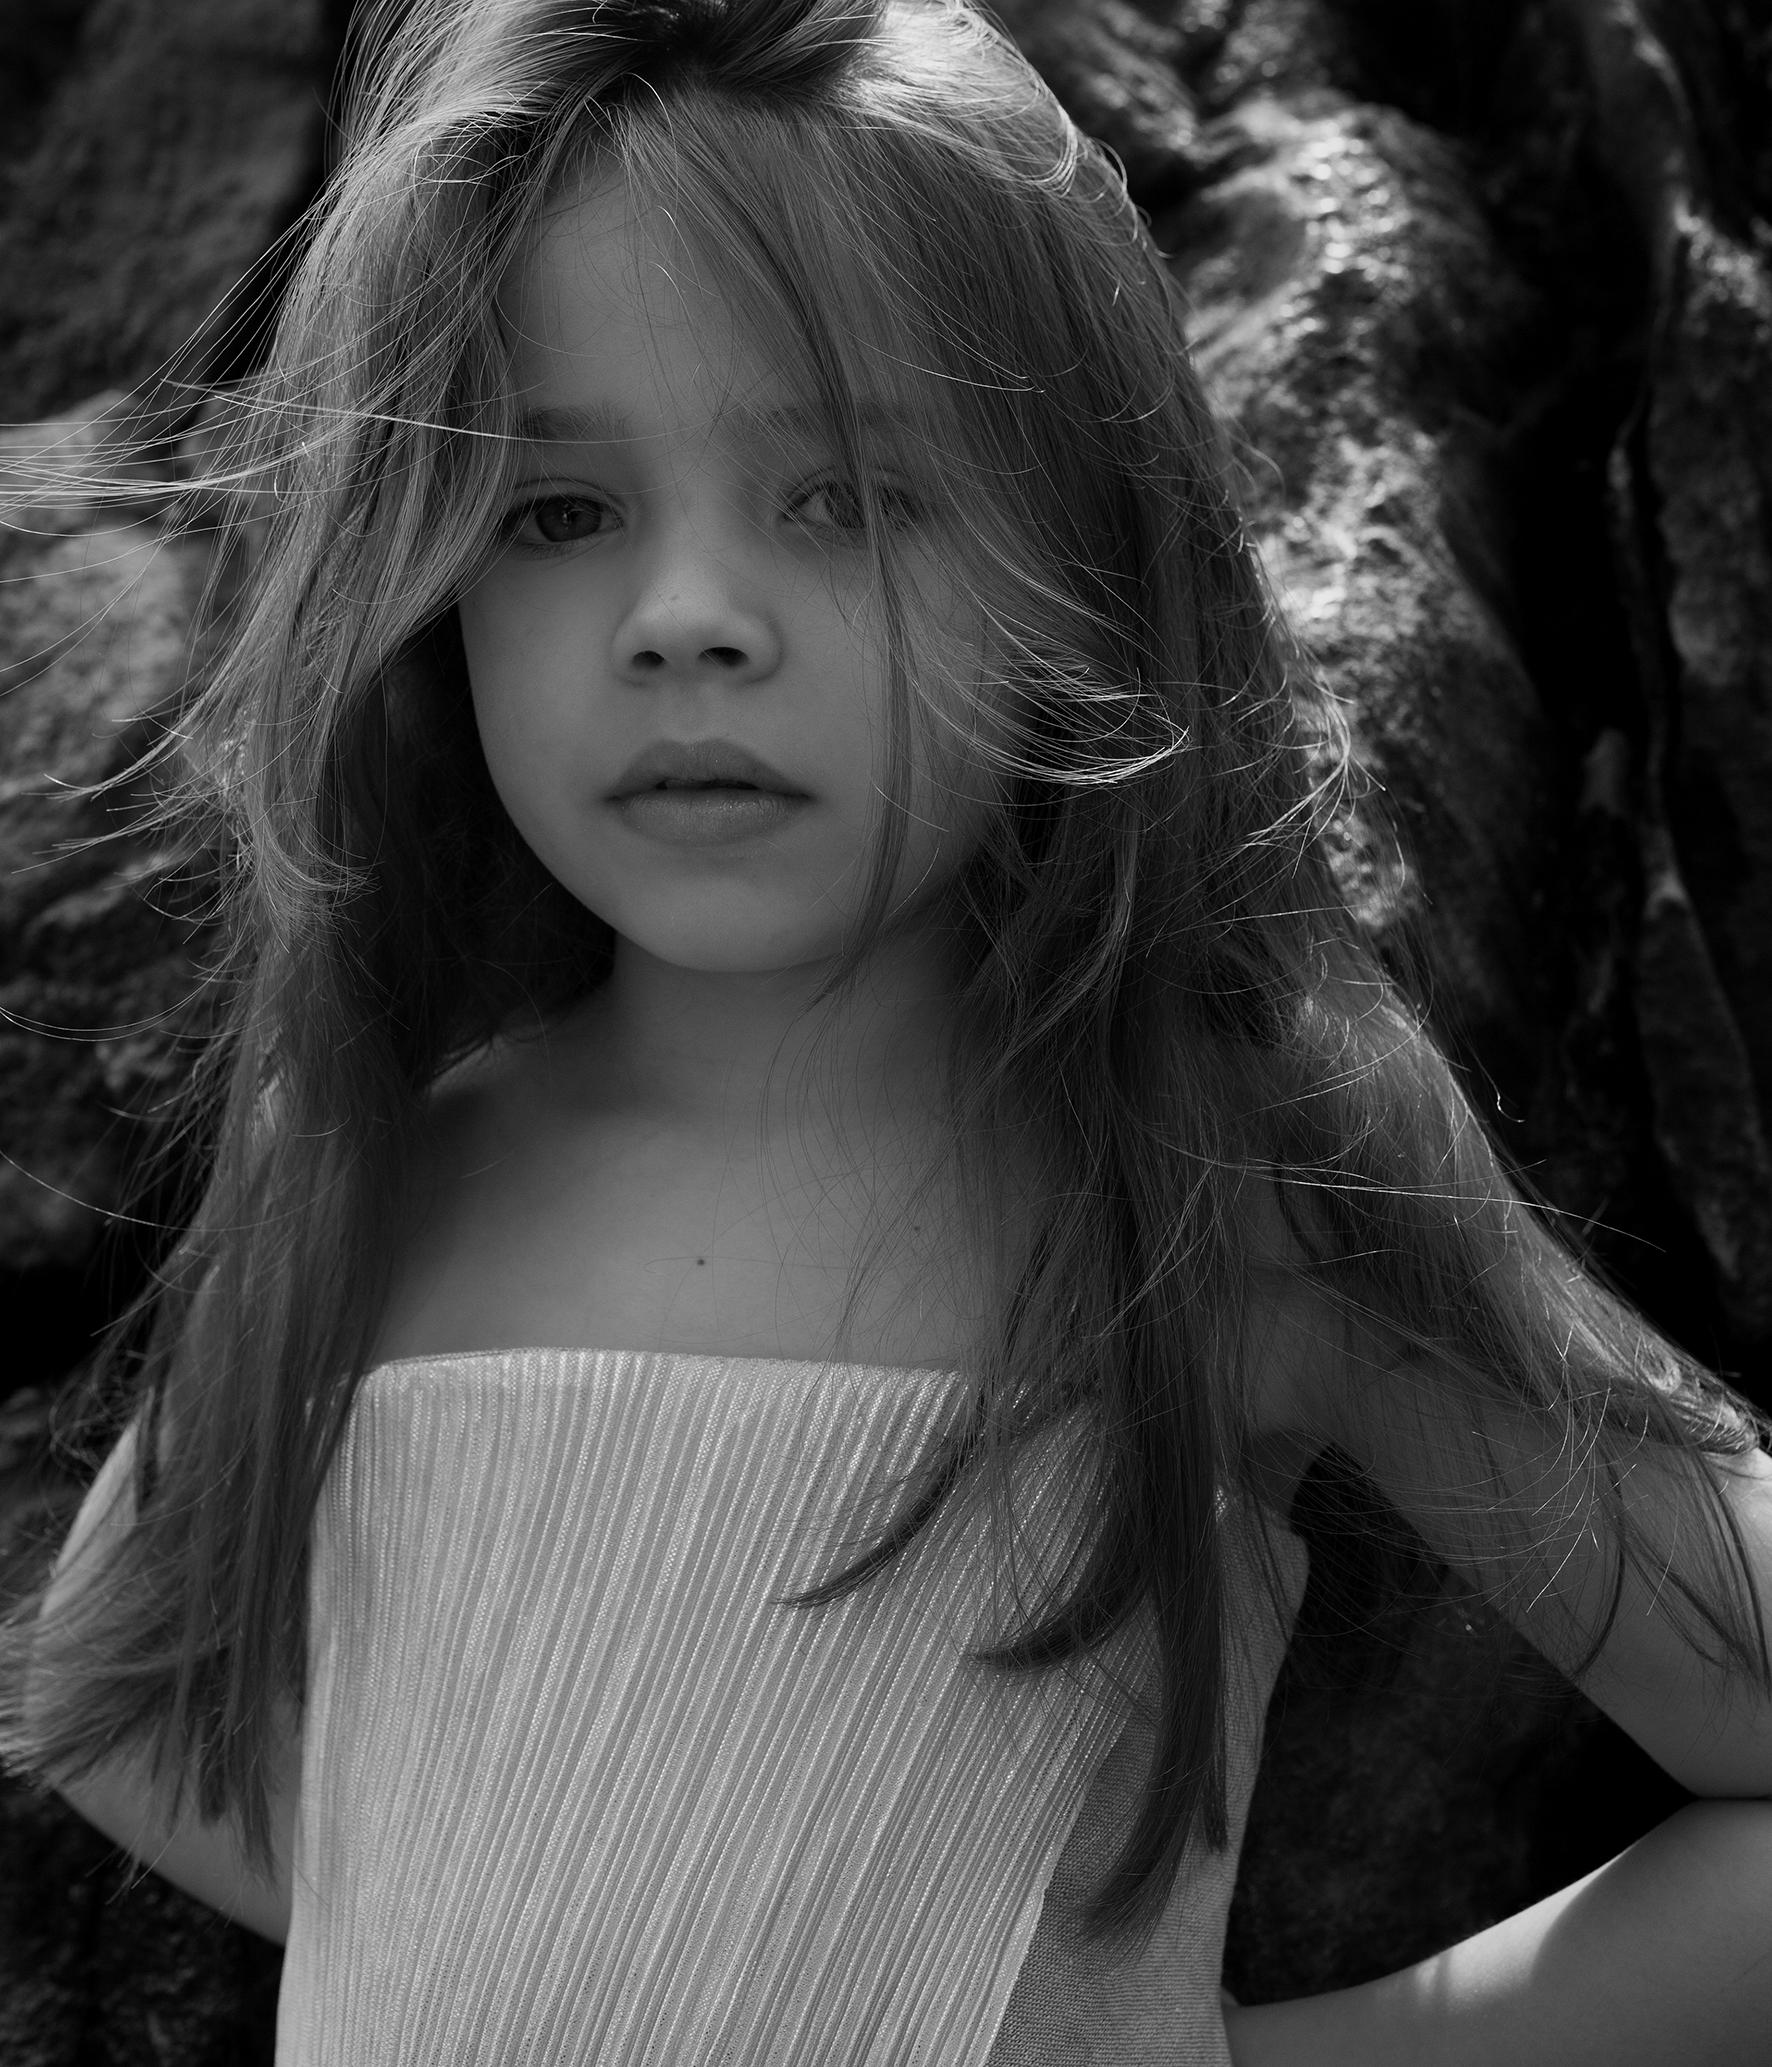 Layla_MG_8915.jpg